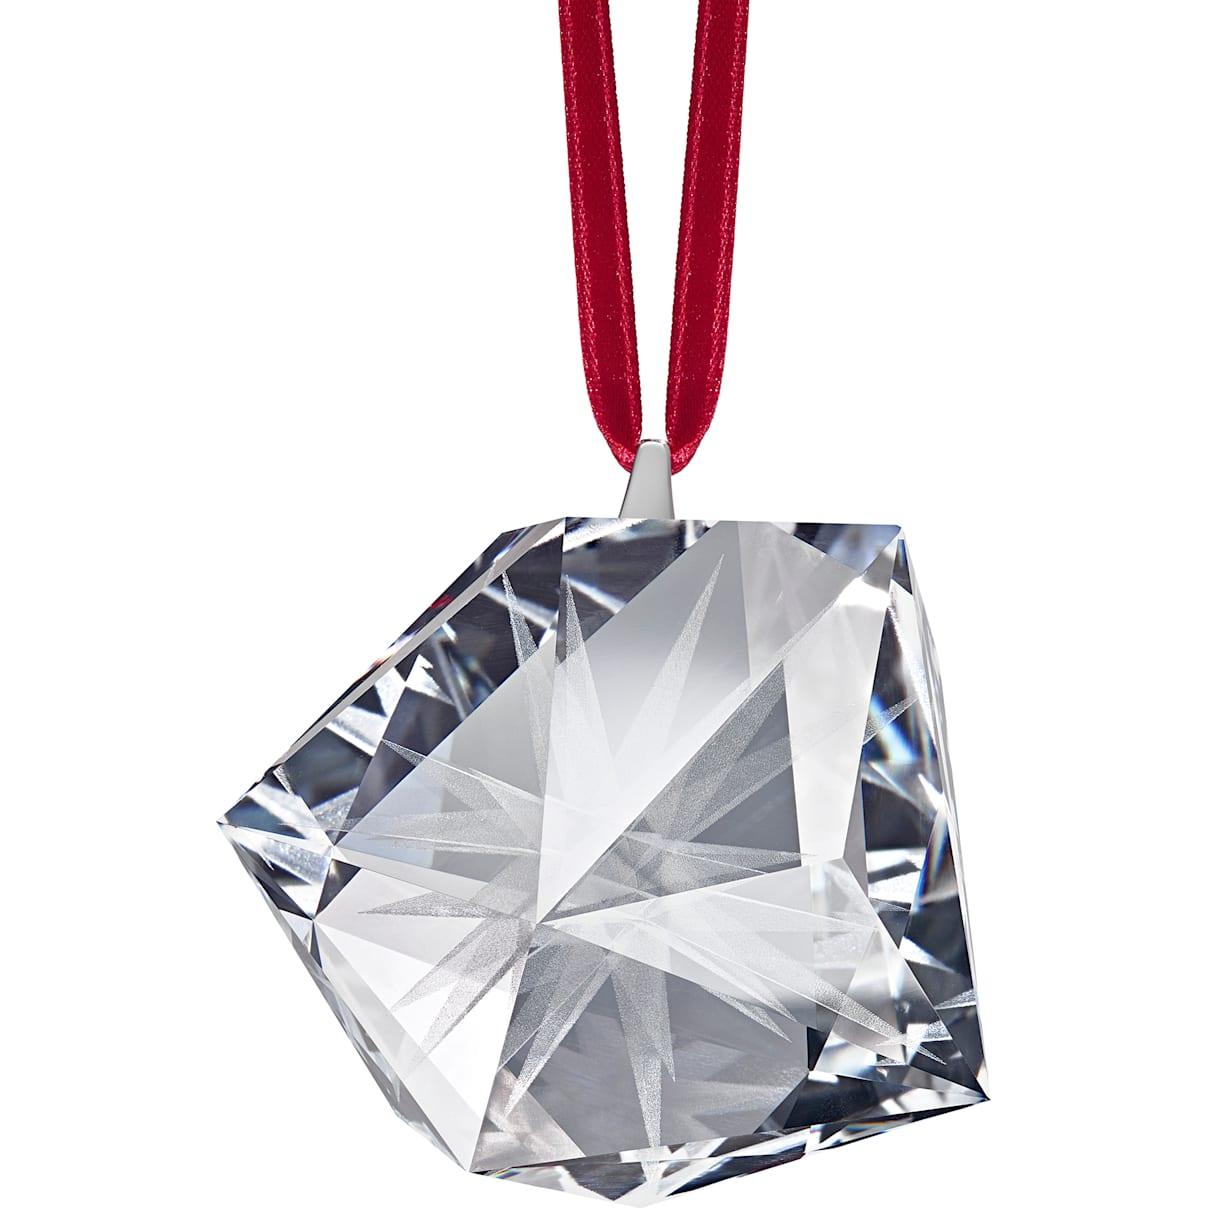 Swarovski Daniel Libeskind Frosted Star Ornament